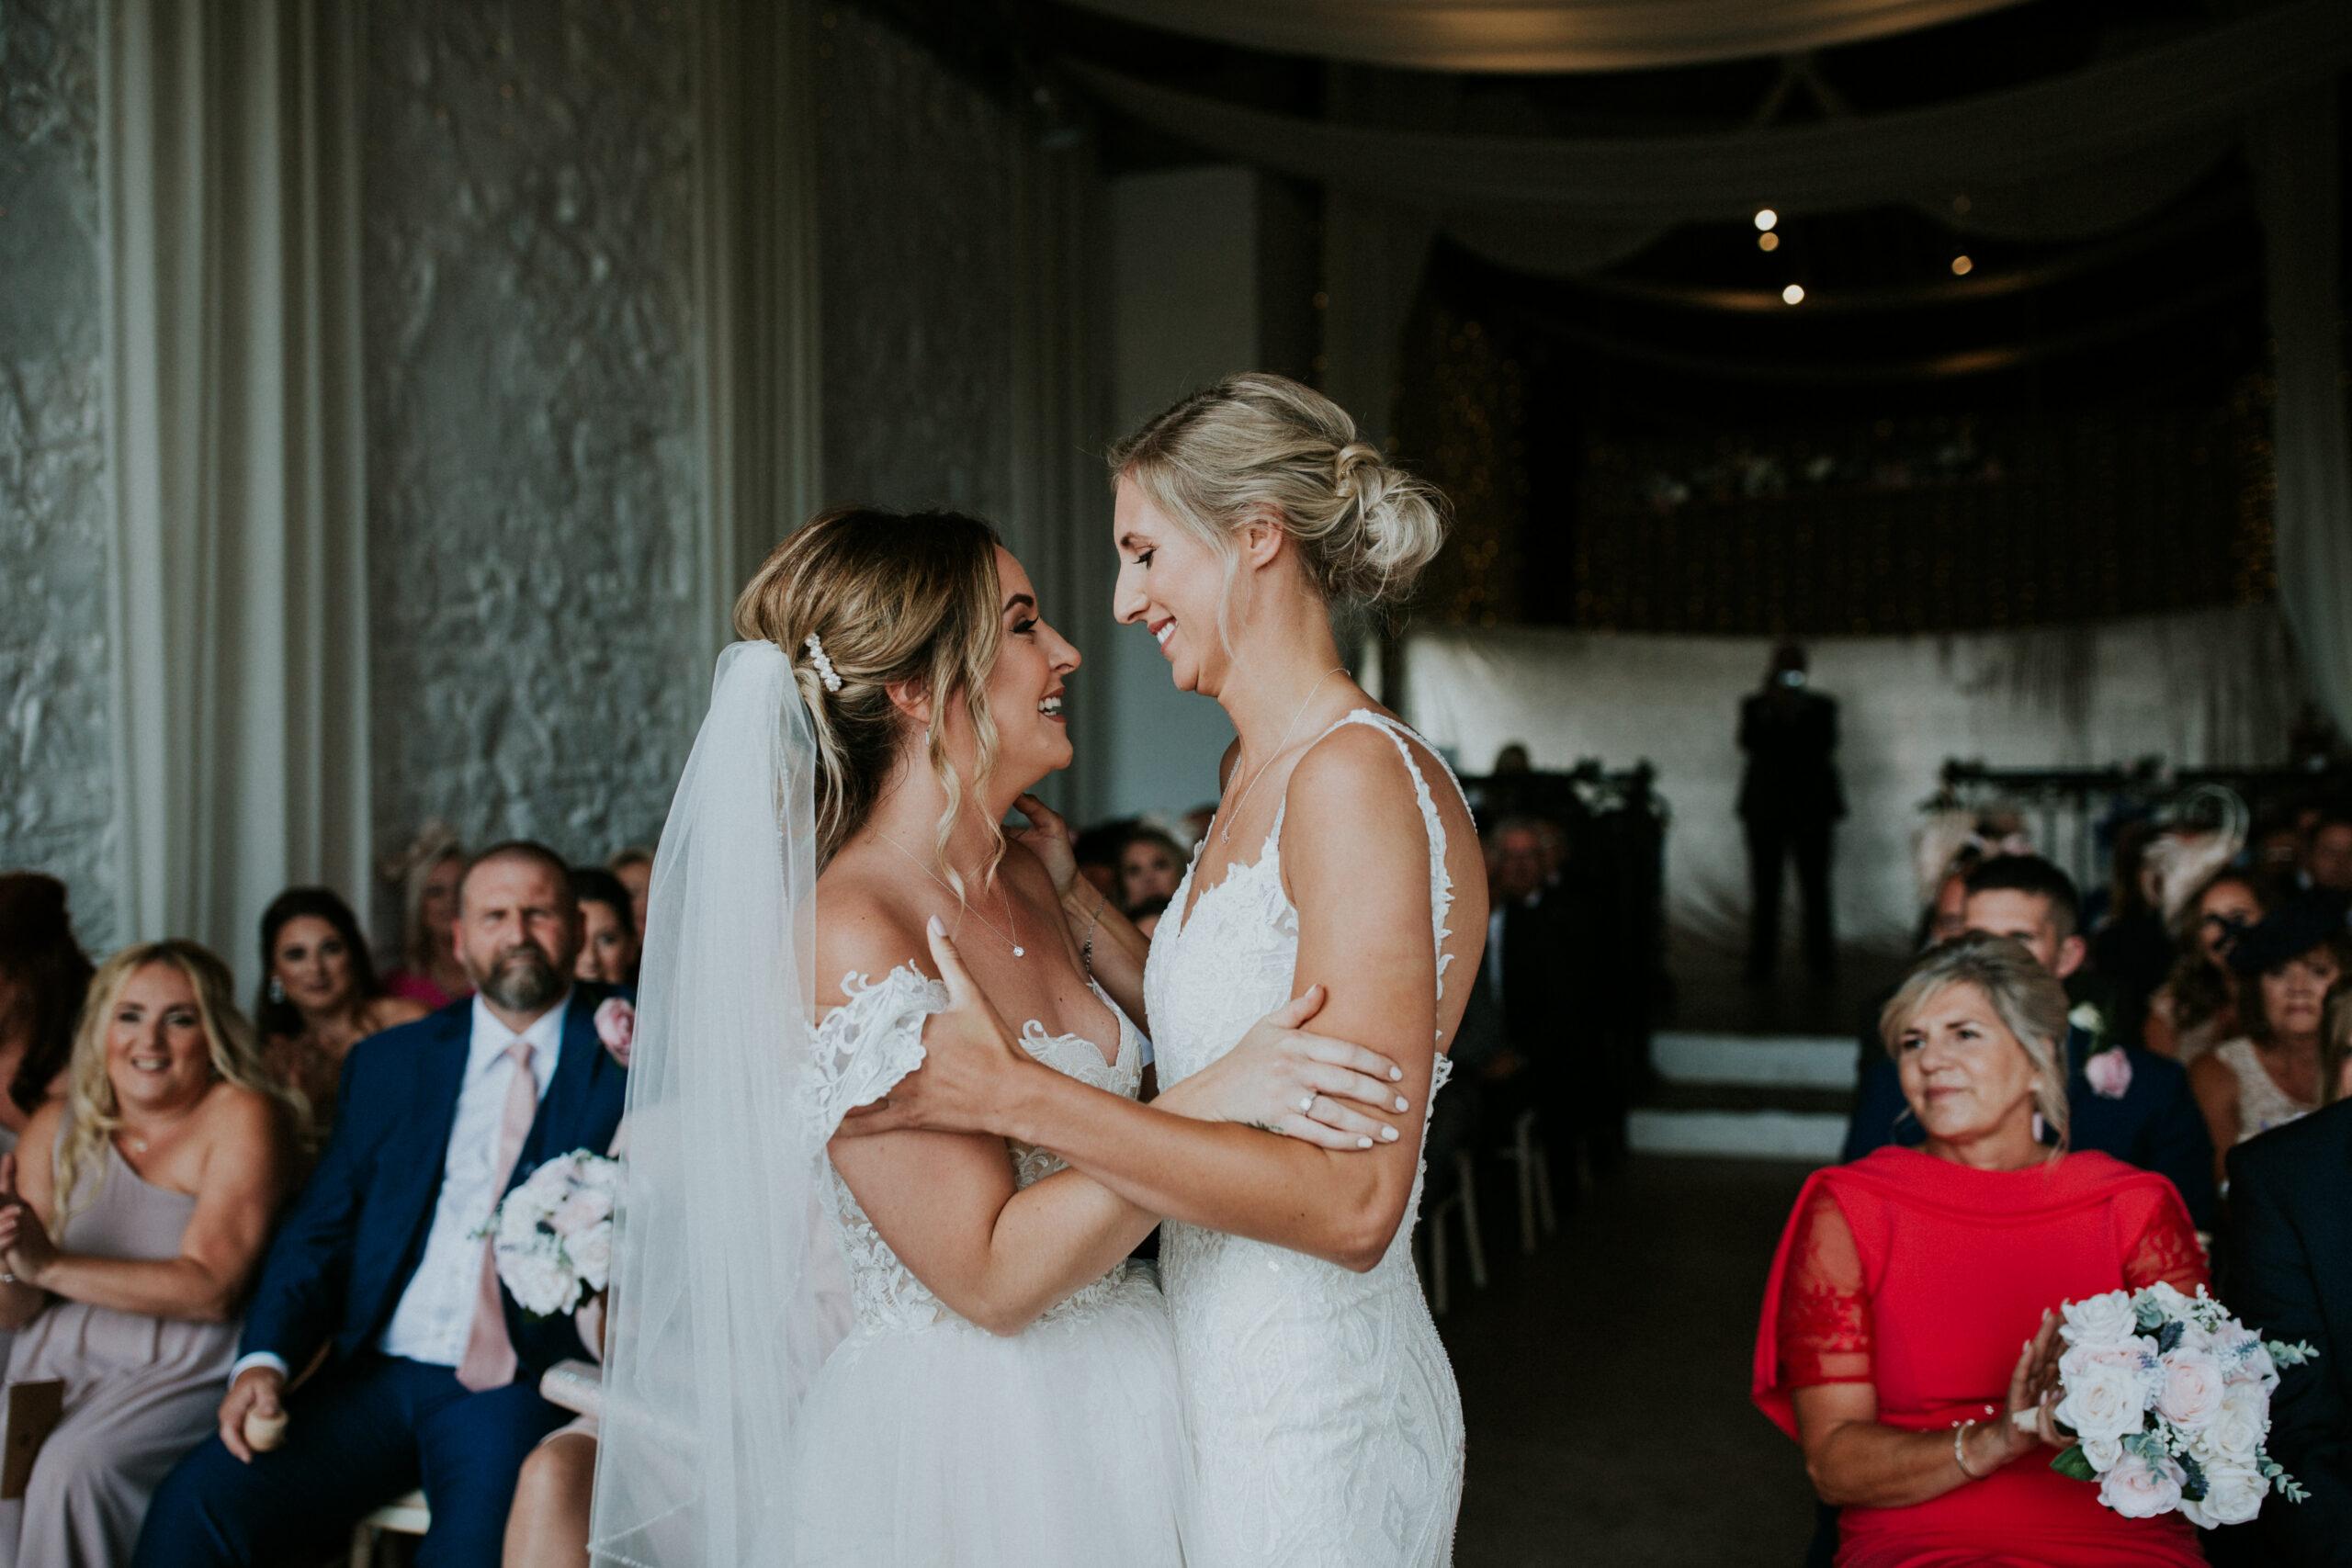 brides exchanging their vows